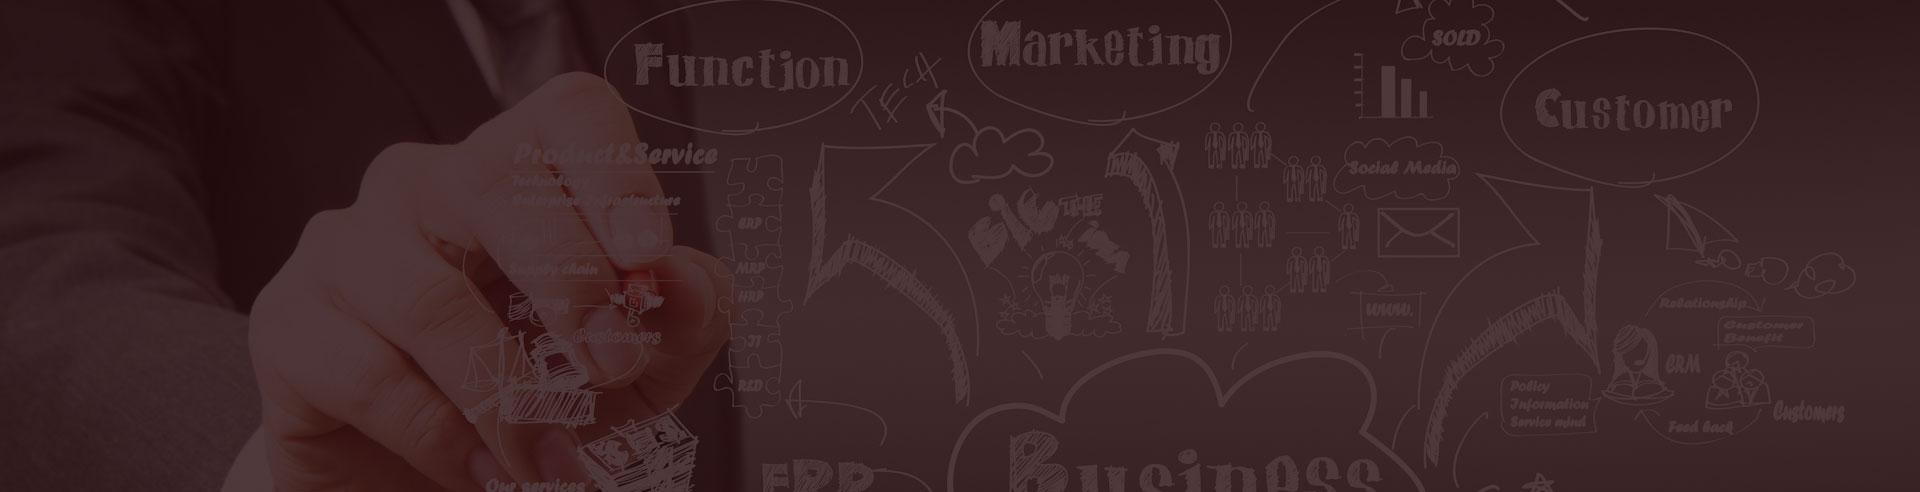 TradeMart - B2B Software, Trading Software, B2B ECommerce